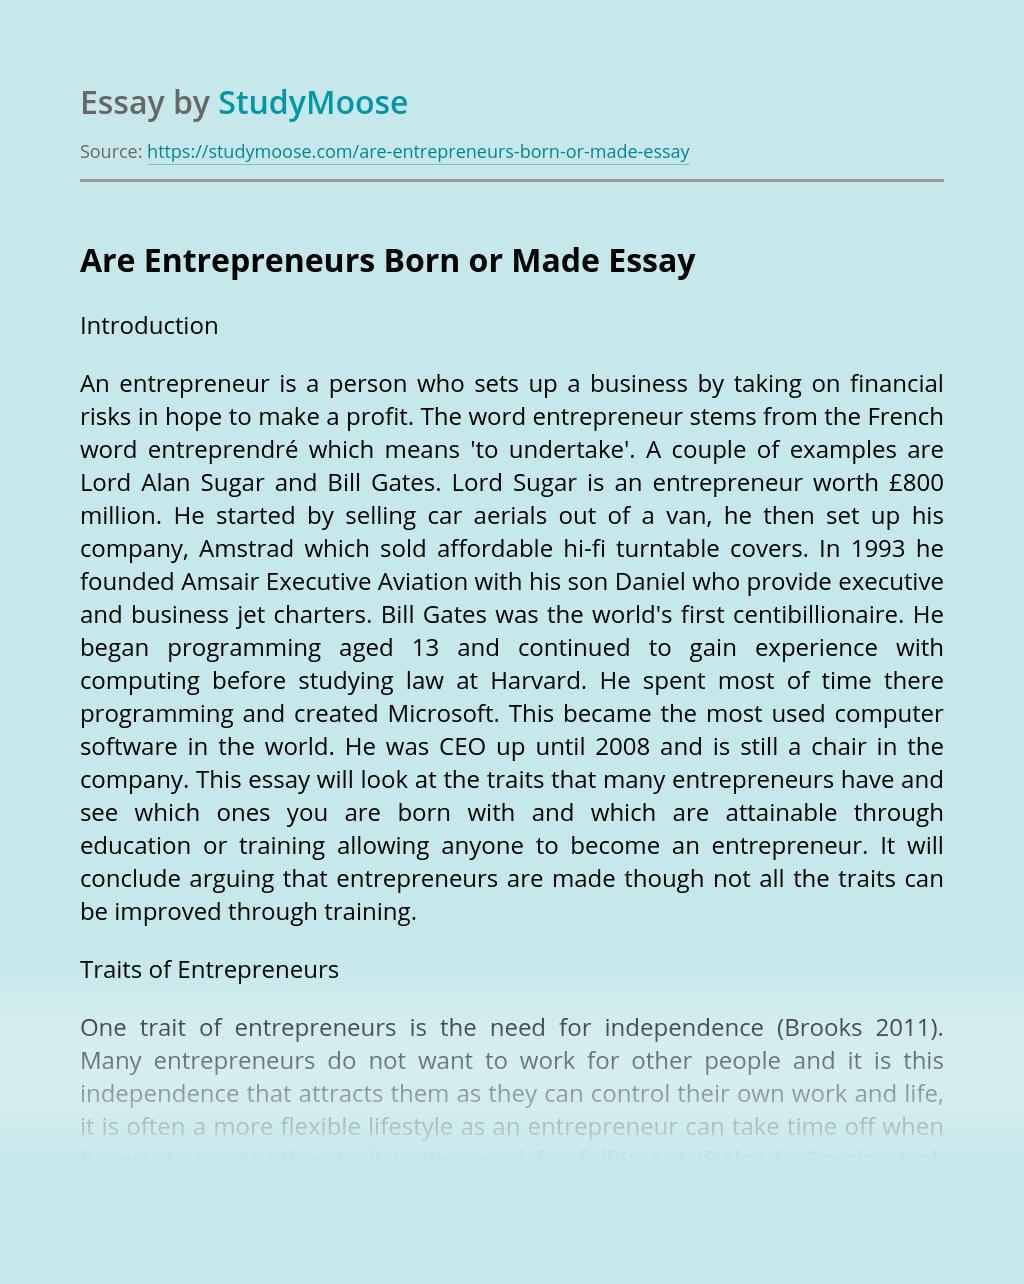 Are Entrepreneurs Born or Made